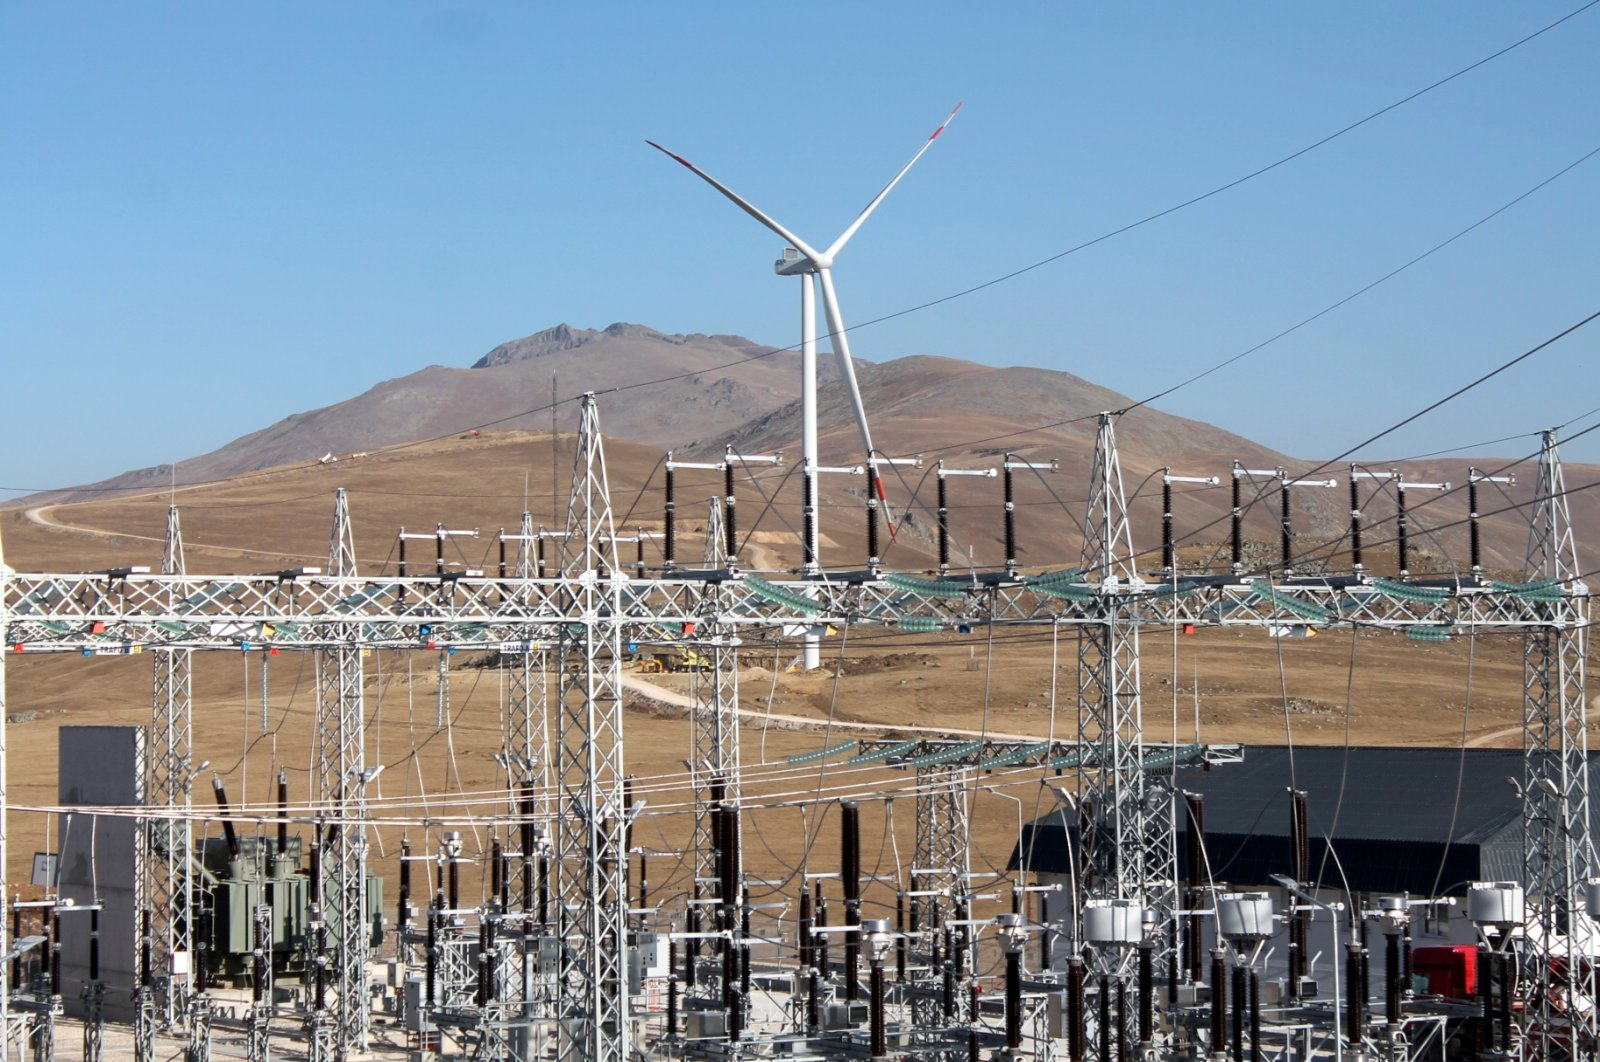 A wind turbine is seen in the northeastern province of Bayburt, Turkey, Oct. 28, 2020. (AA Photo)